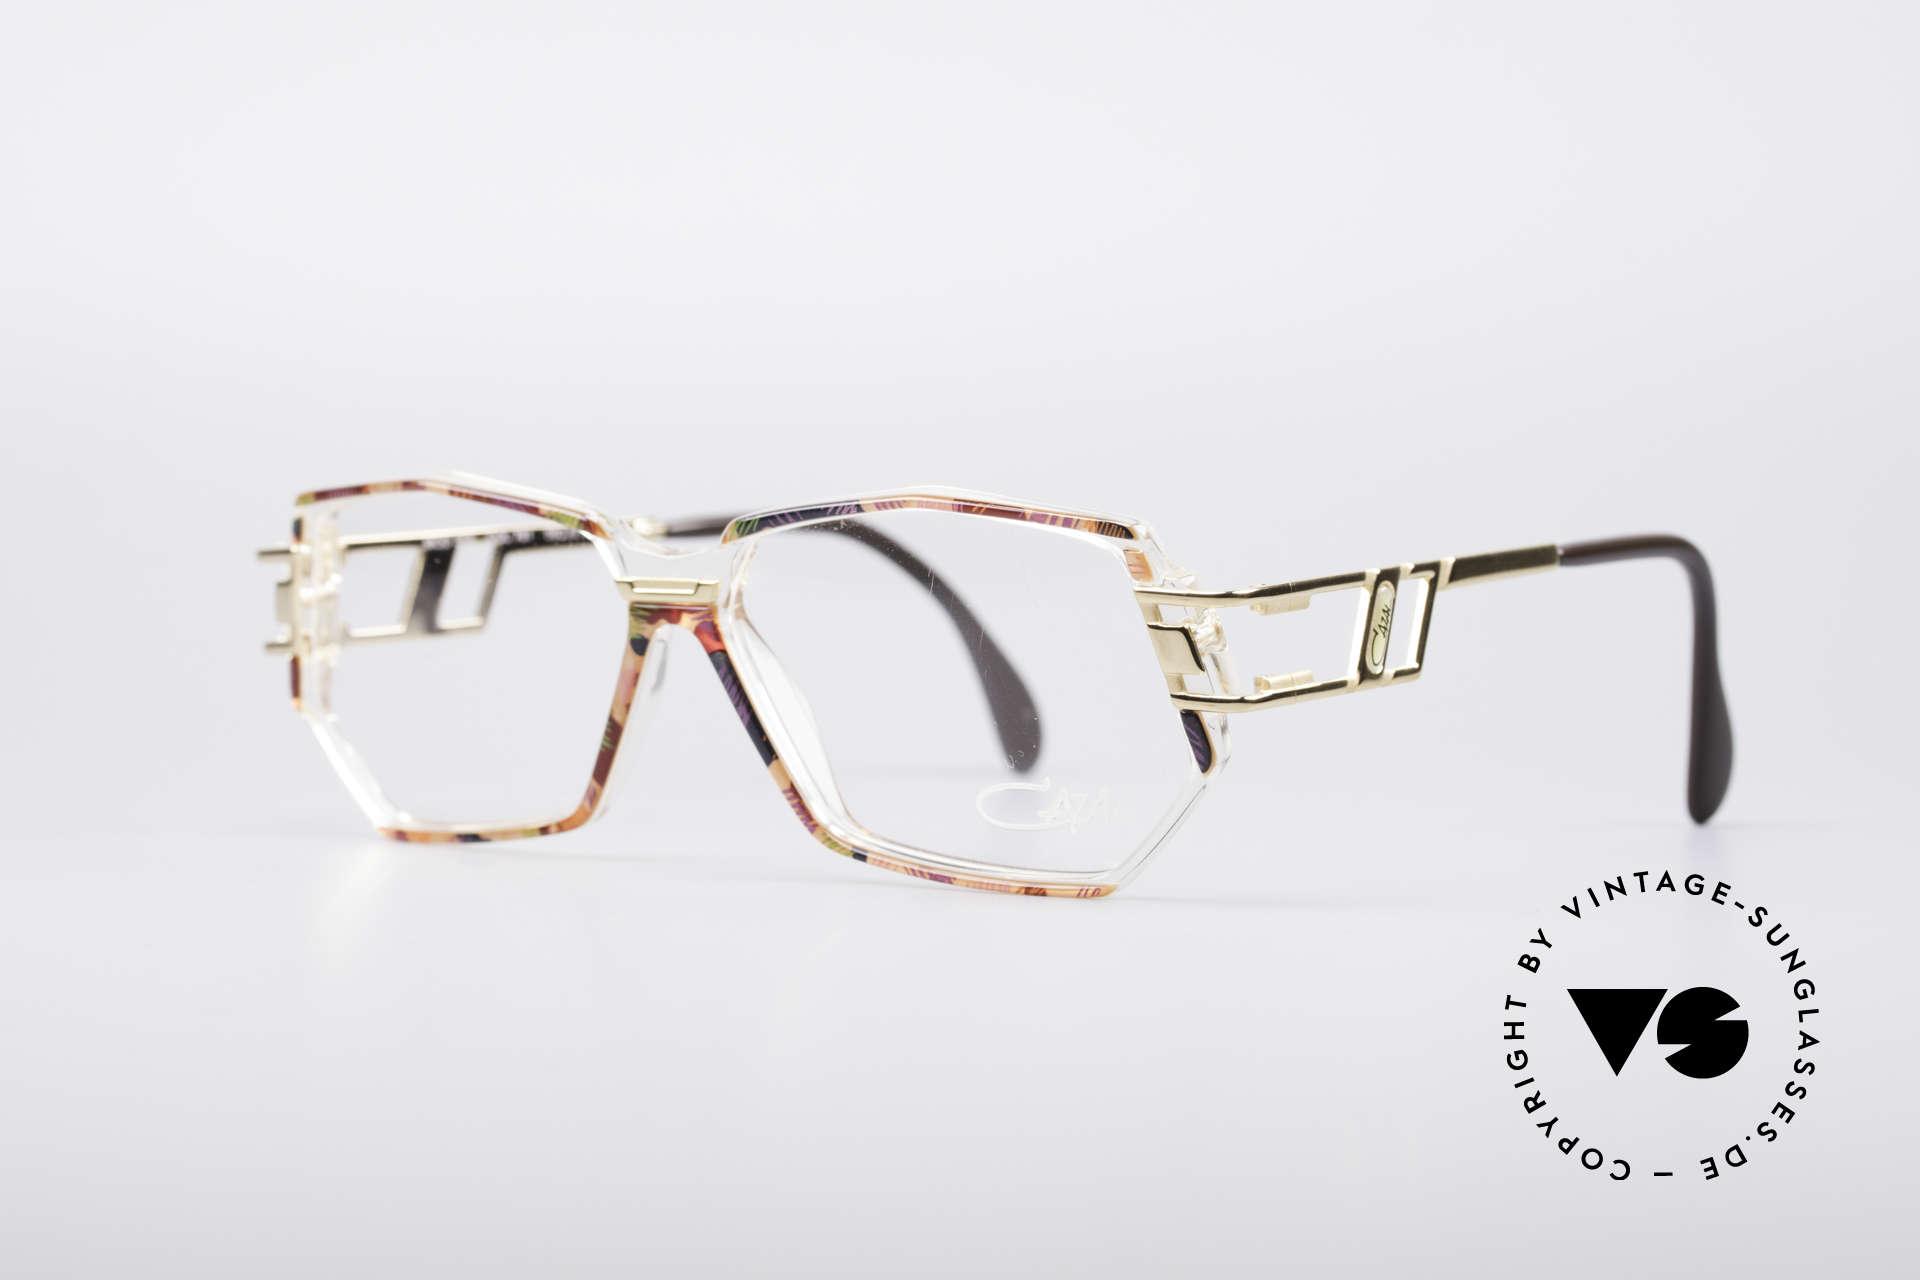 Cazal 359 90's Hip Hop Eyeglasses, color description: blue-red multicolor / crystal / gold, Made for Women